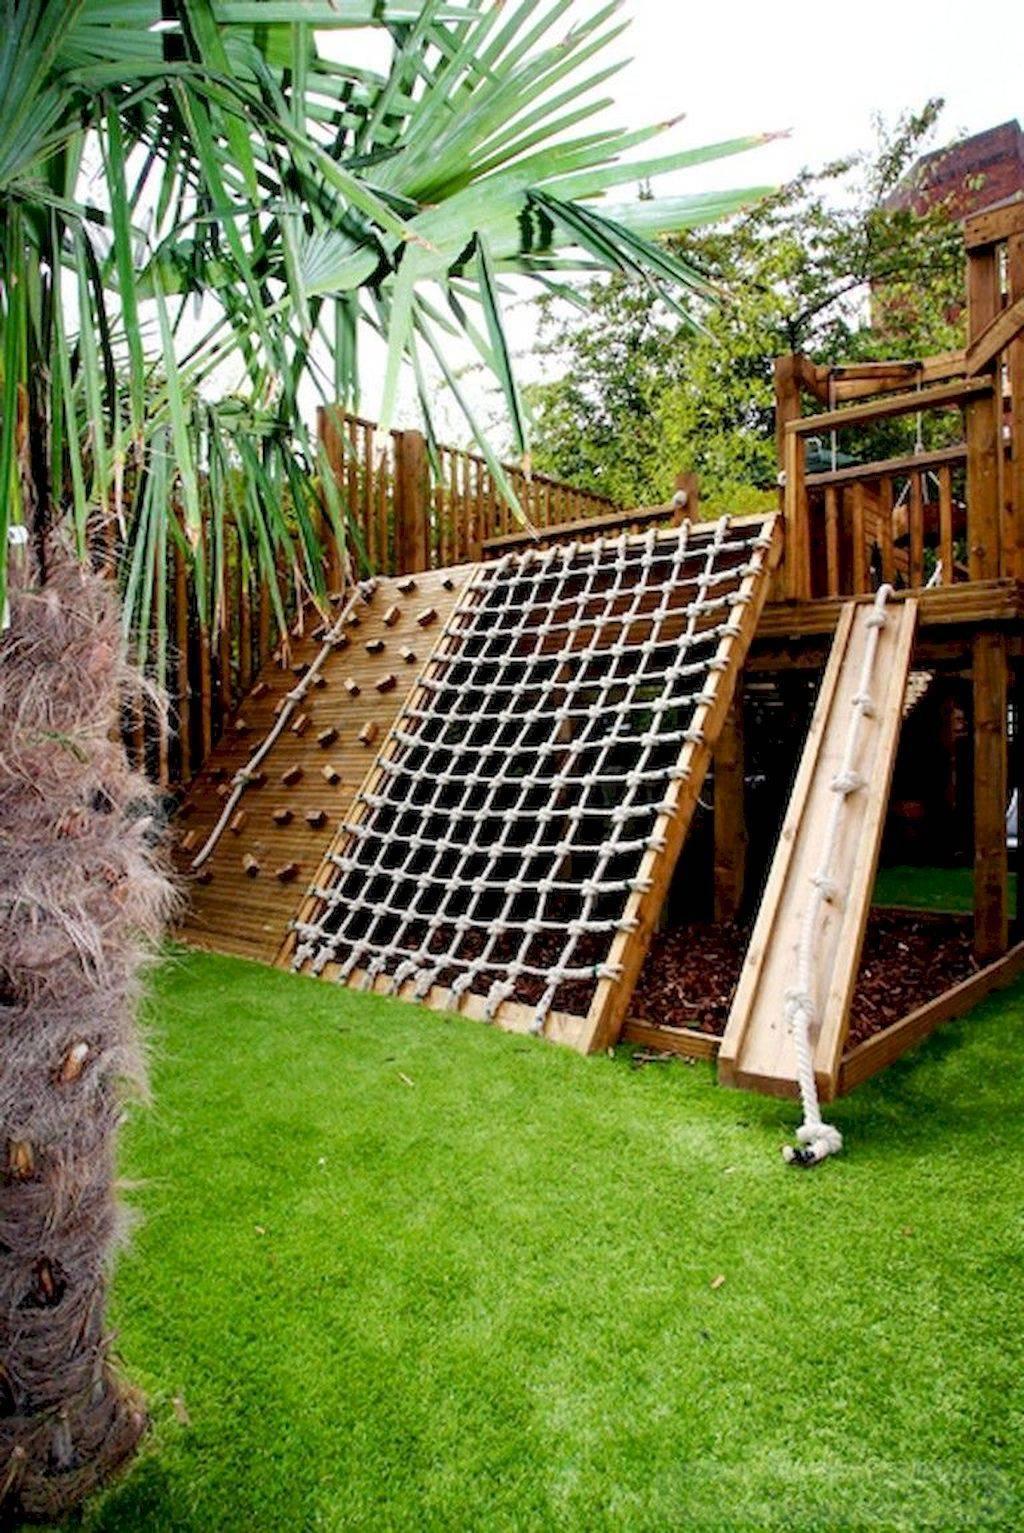 natural playground ideas-860820916255191351